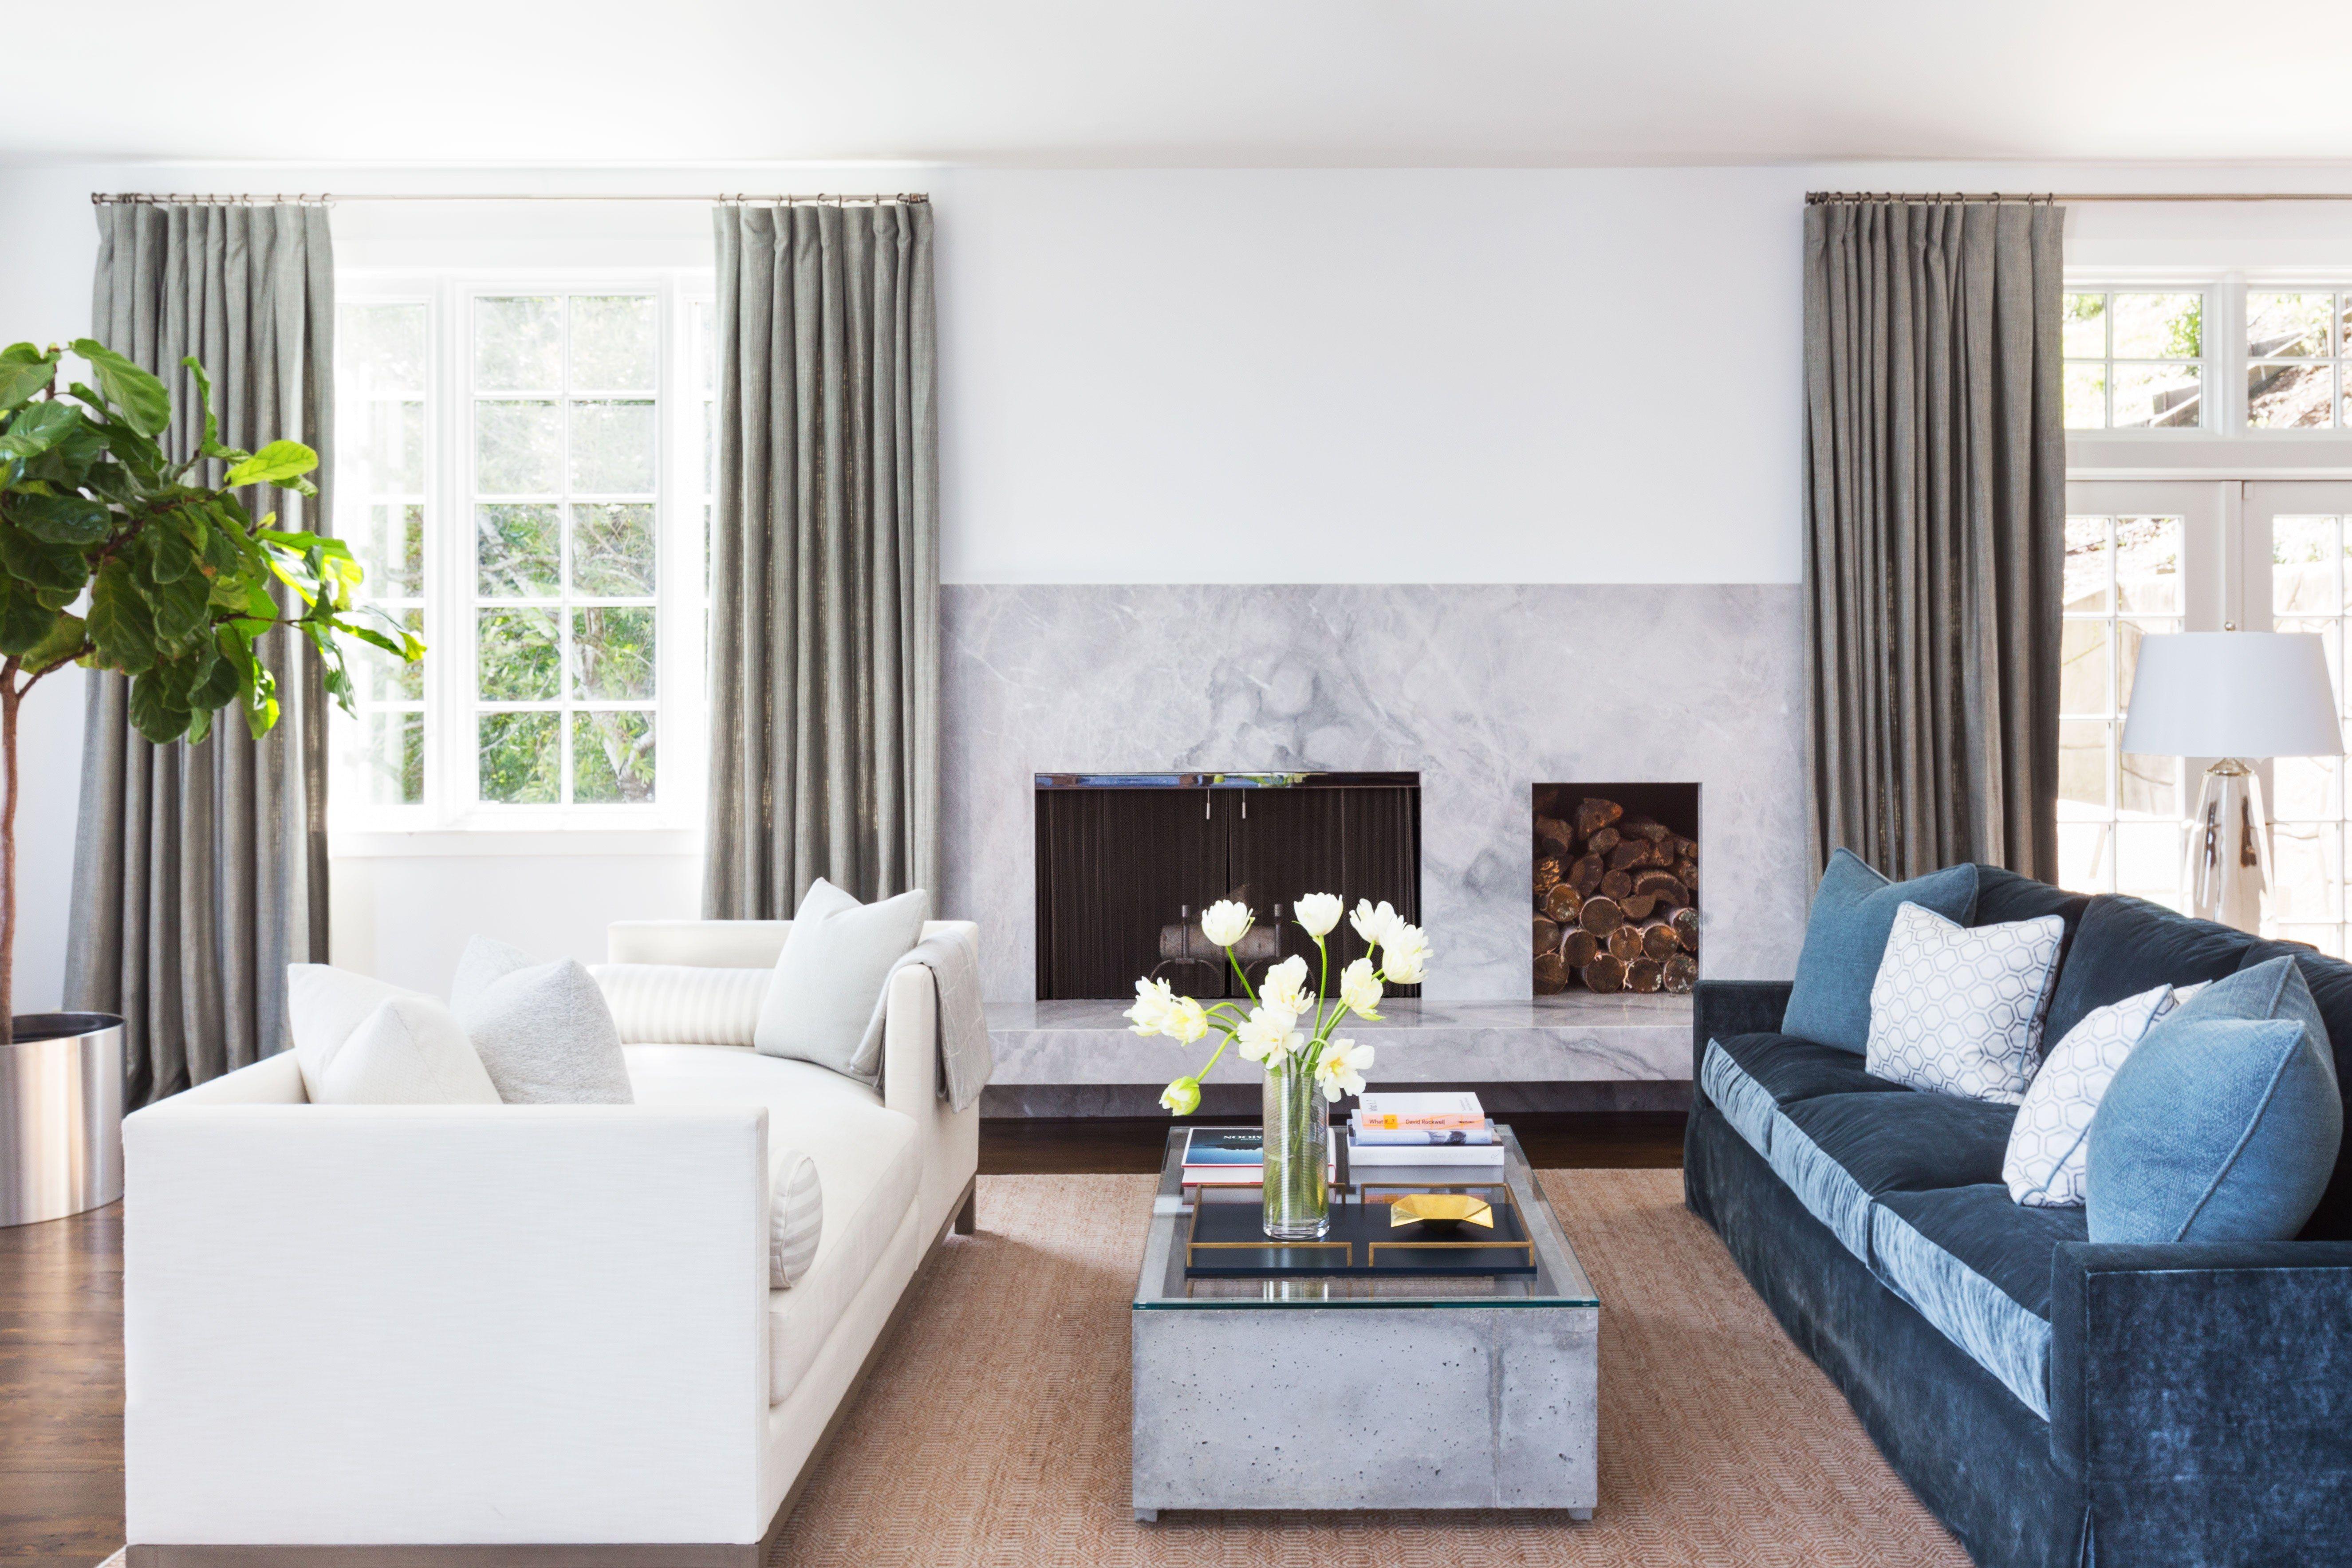 Tour a Bright Modern Family Home in California | Pinterest | Marin ...